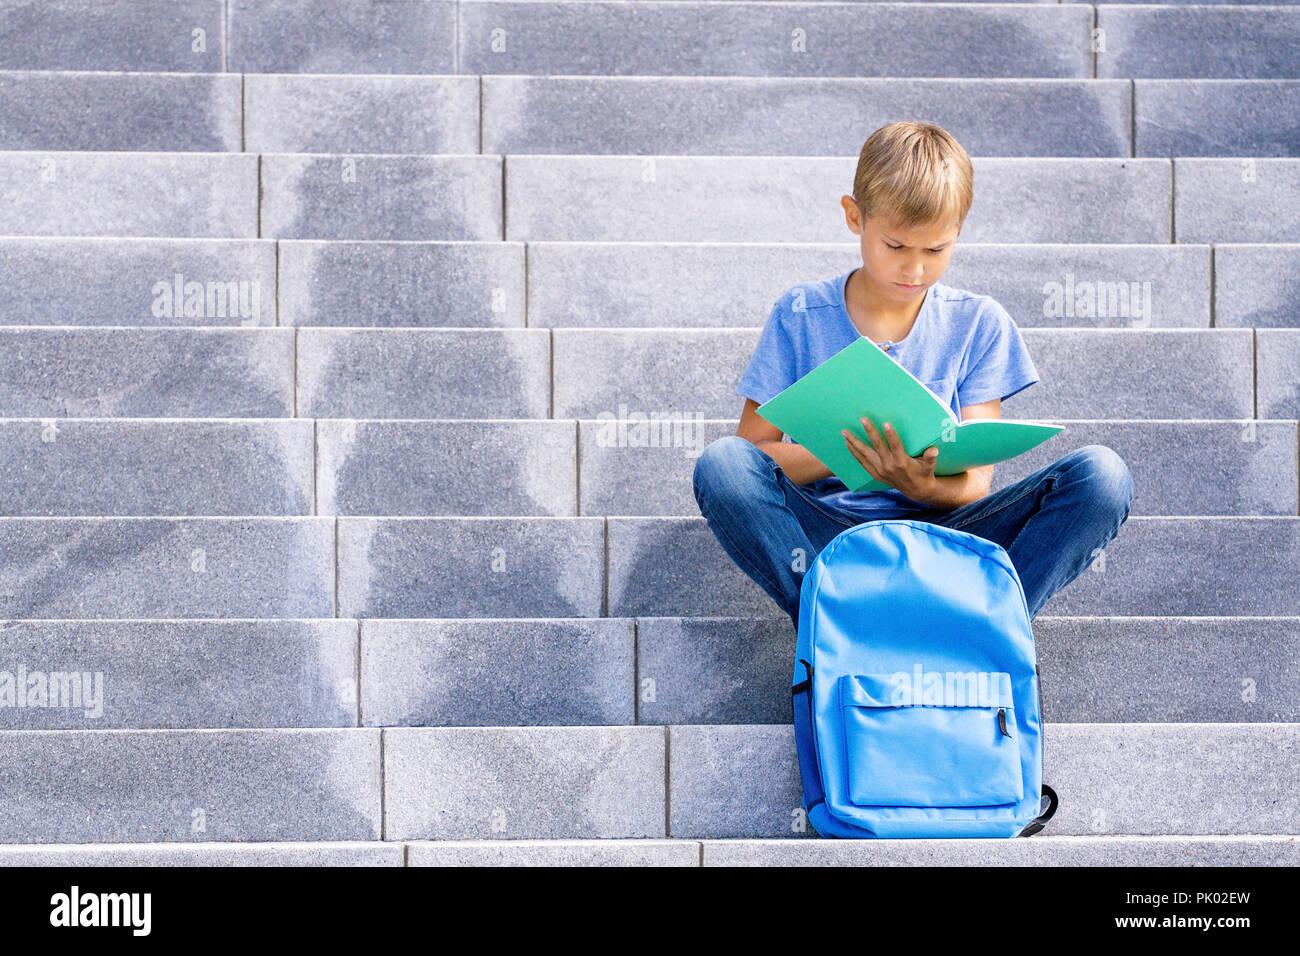 37fa995c5 School Kids Sitting On Stairs Imágenes De Stock & School Kids ...